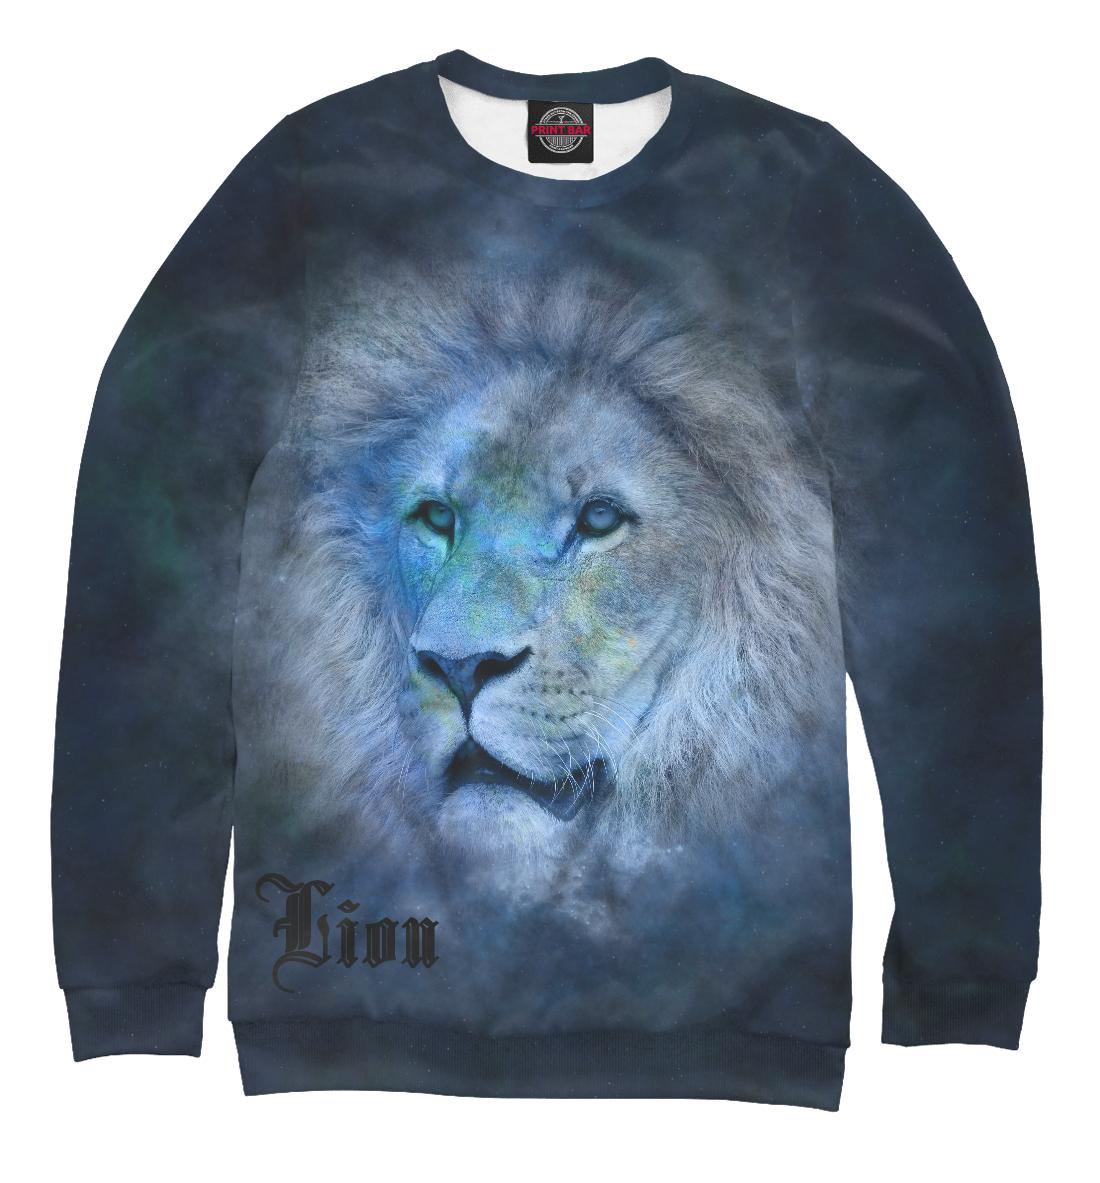 Купить Lion, Printbar, Свитшоты, LEV-224318-swi-1